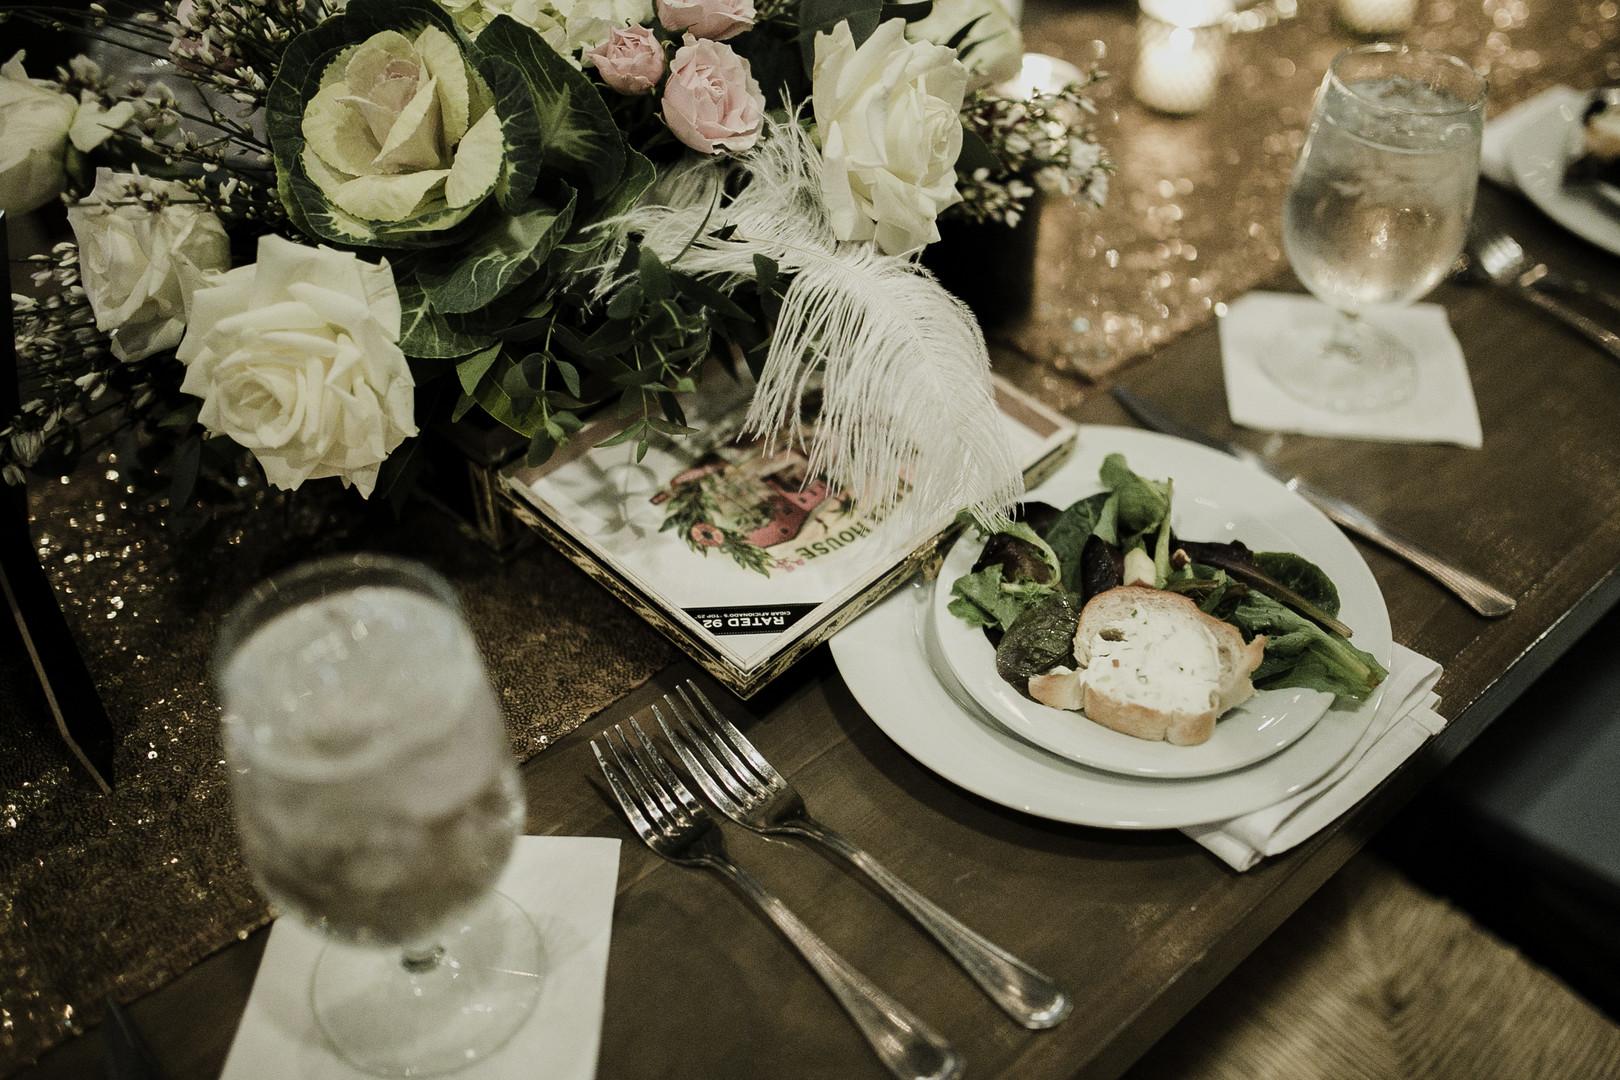 soho-south-cafe-wedding-45.jpg